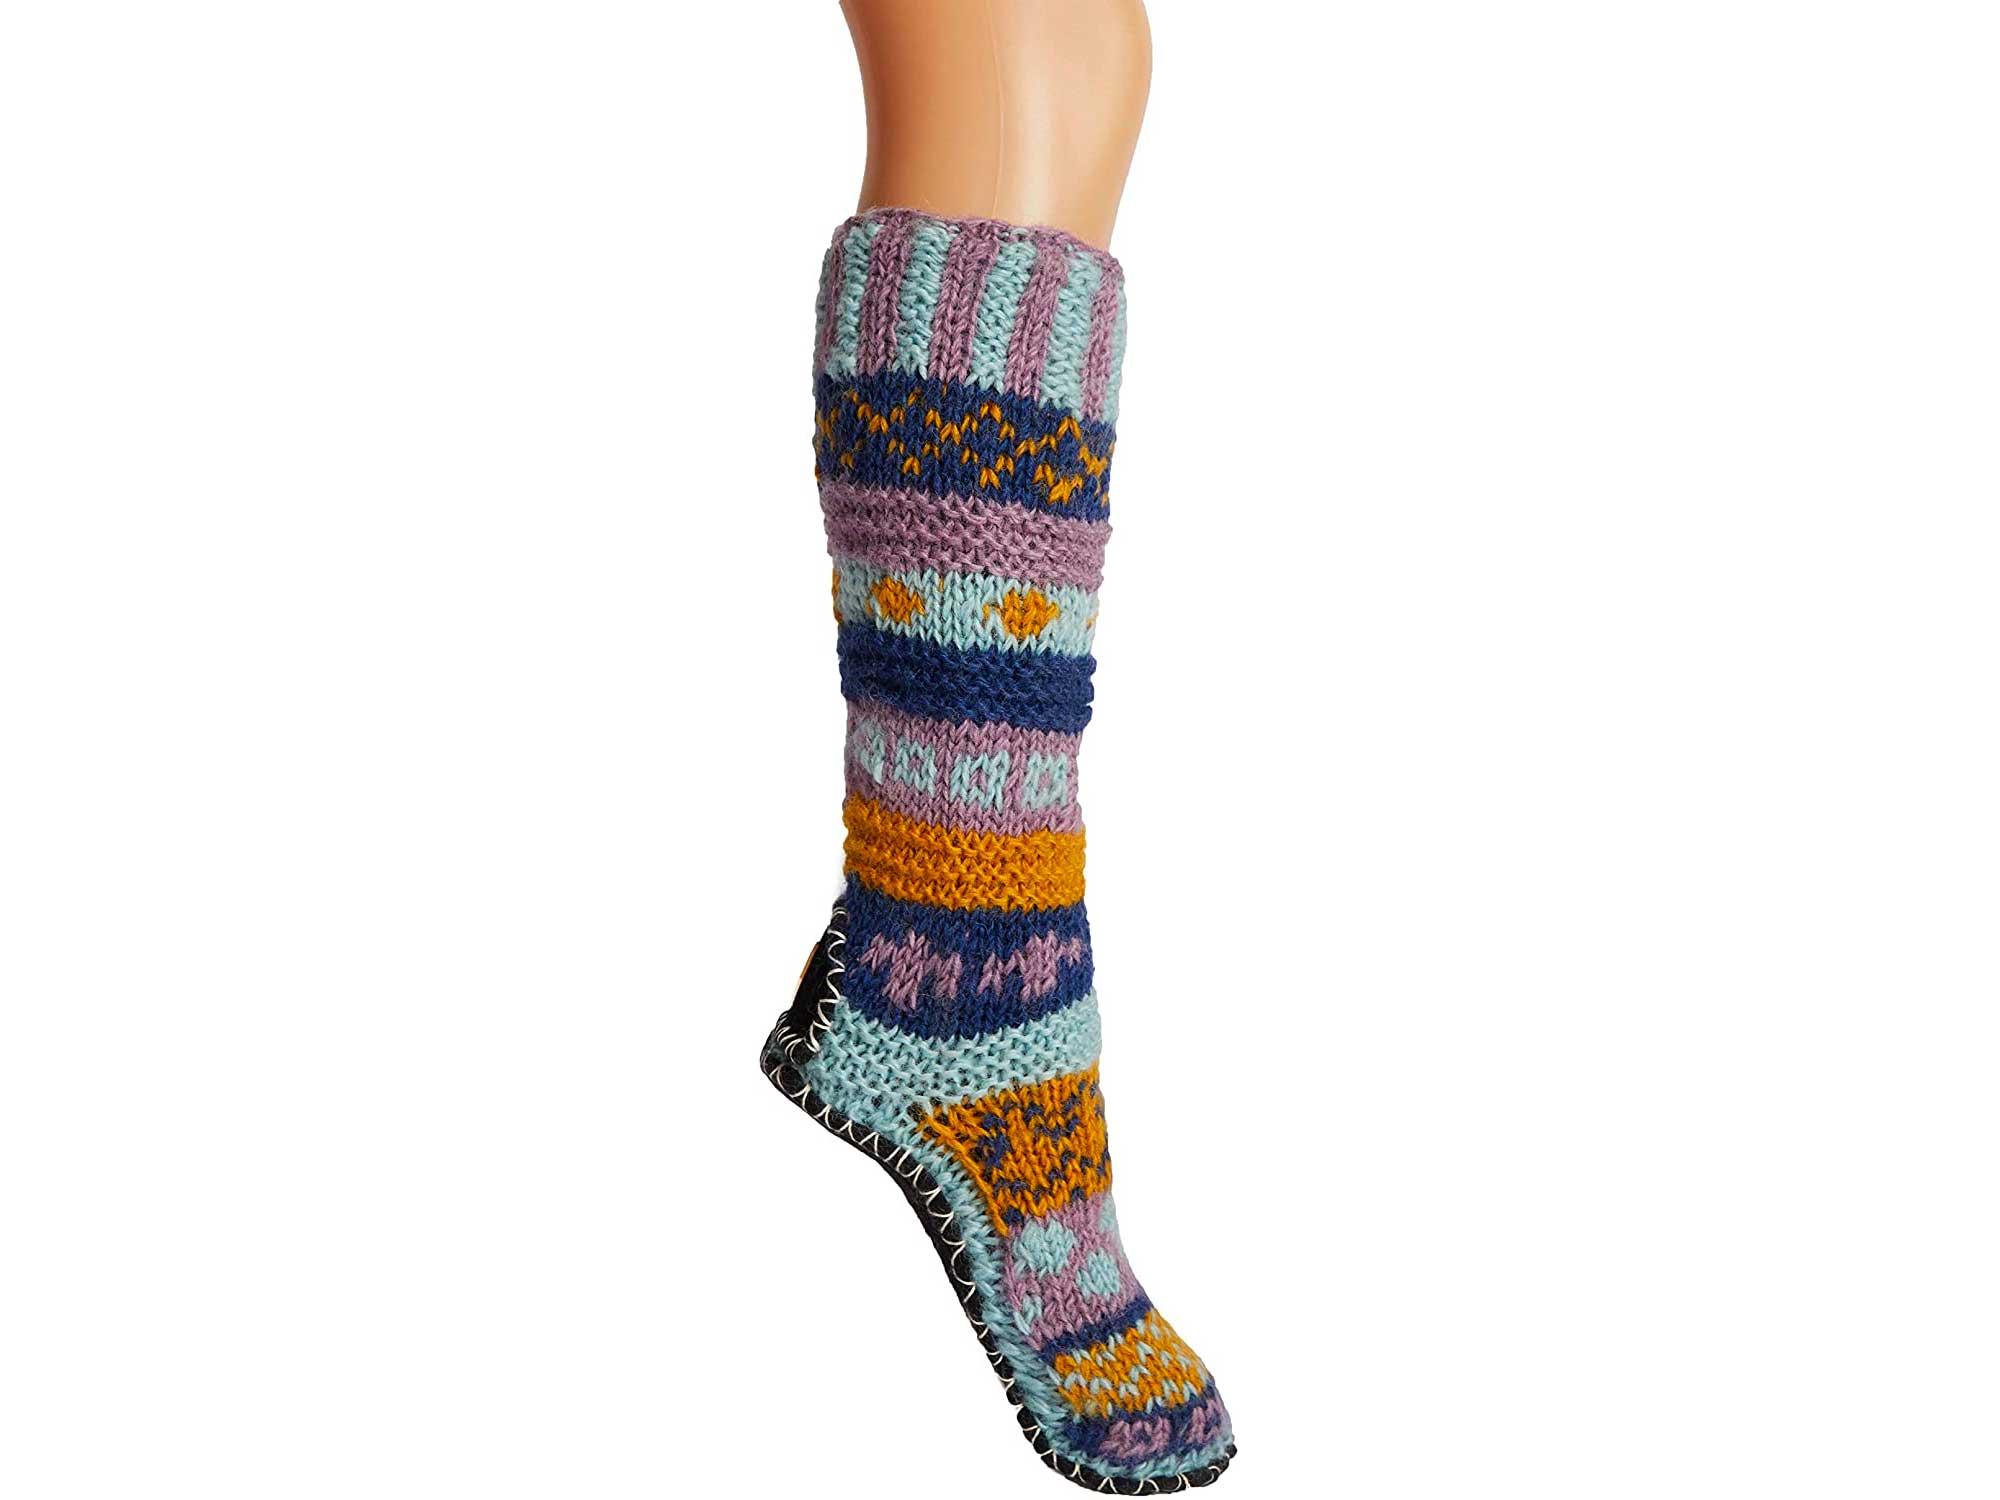 Tibetan Socks are the best warm socks for a cabin trip